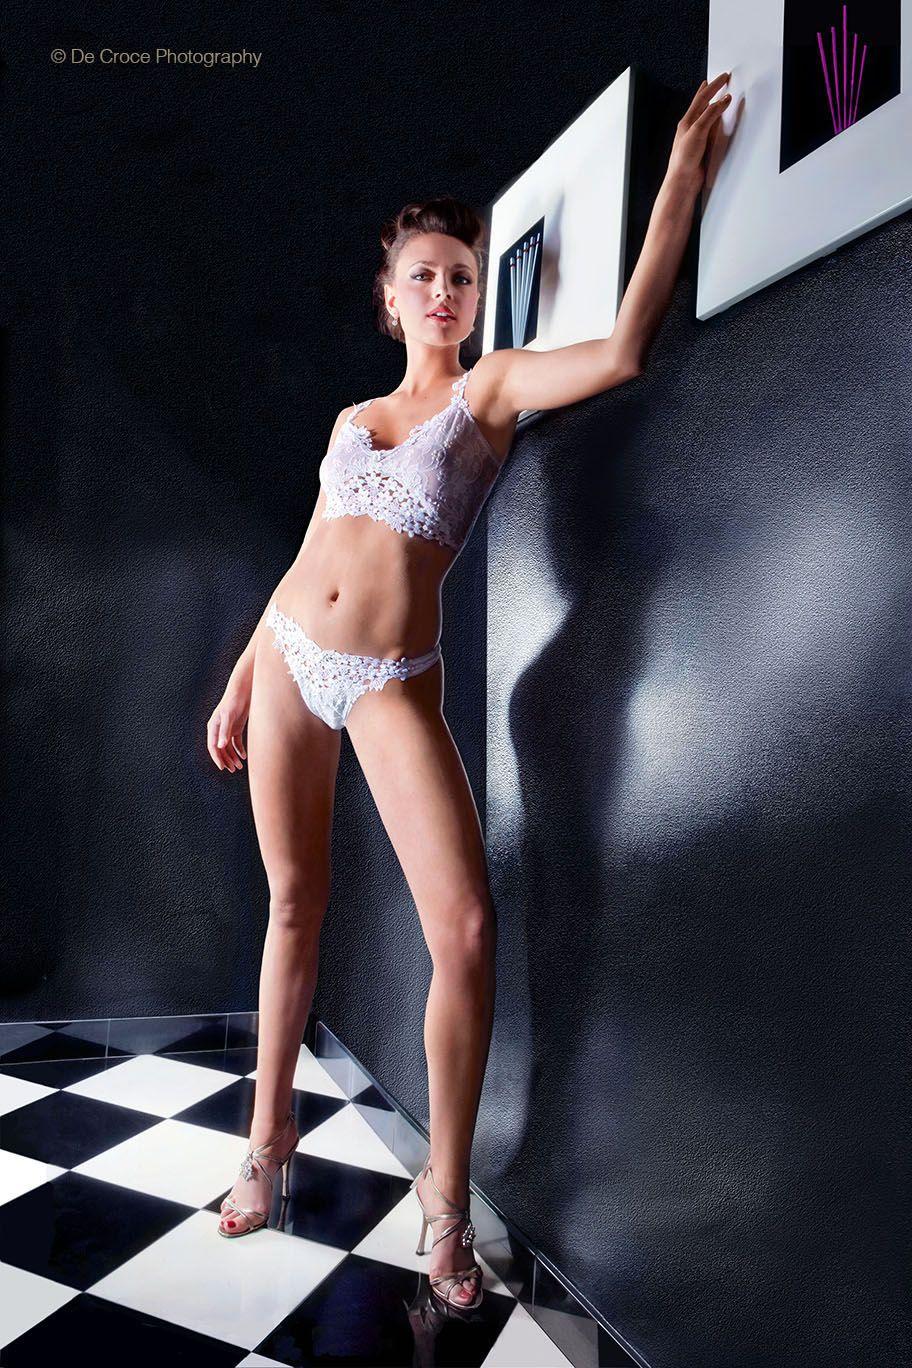 Advertising Photo Denver: Model in Men's Room